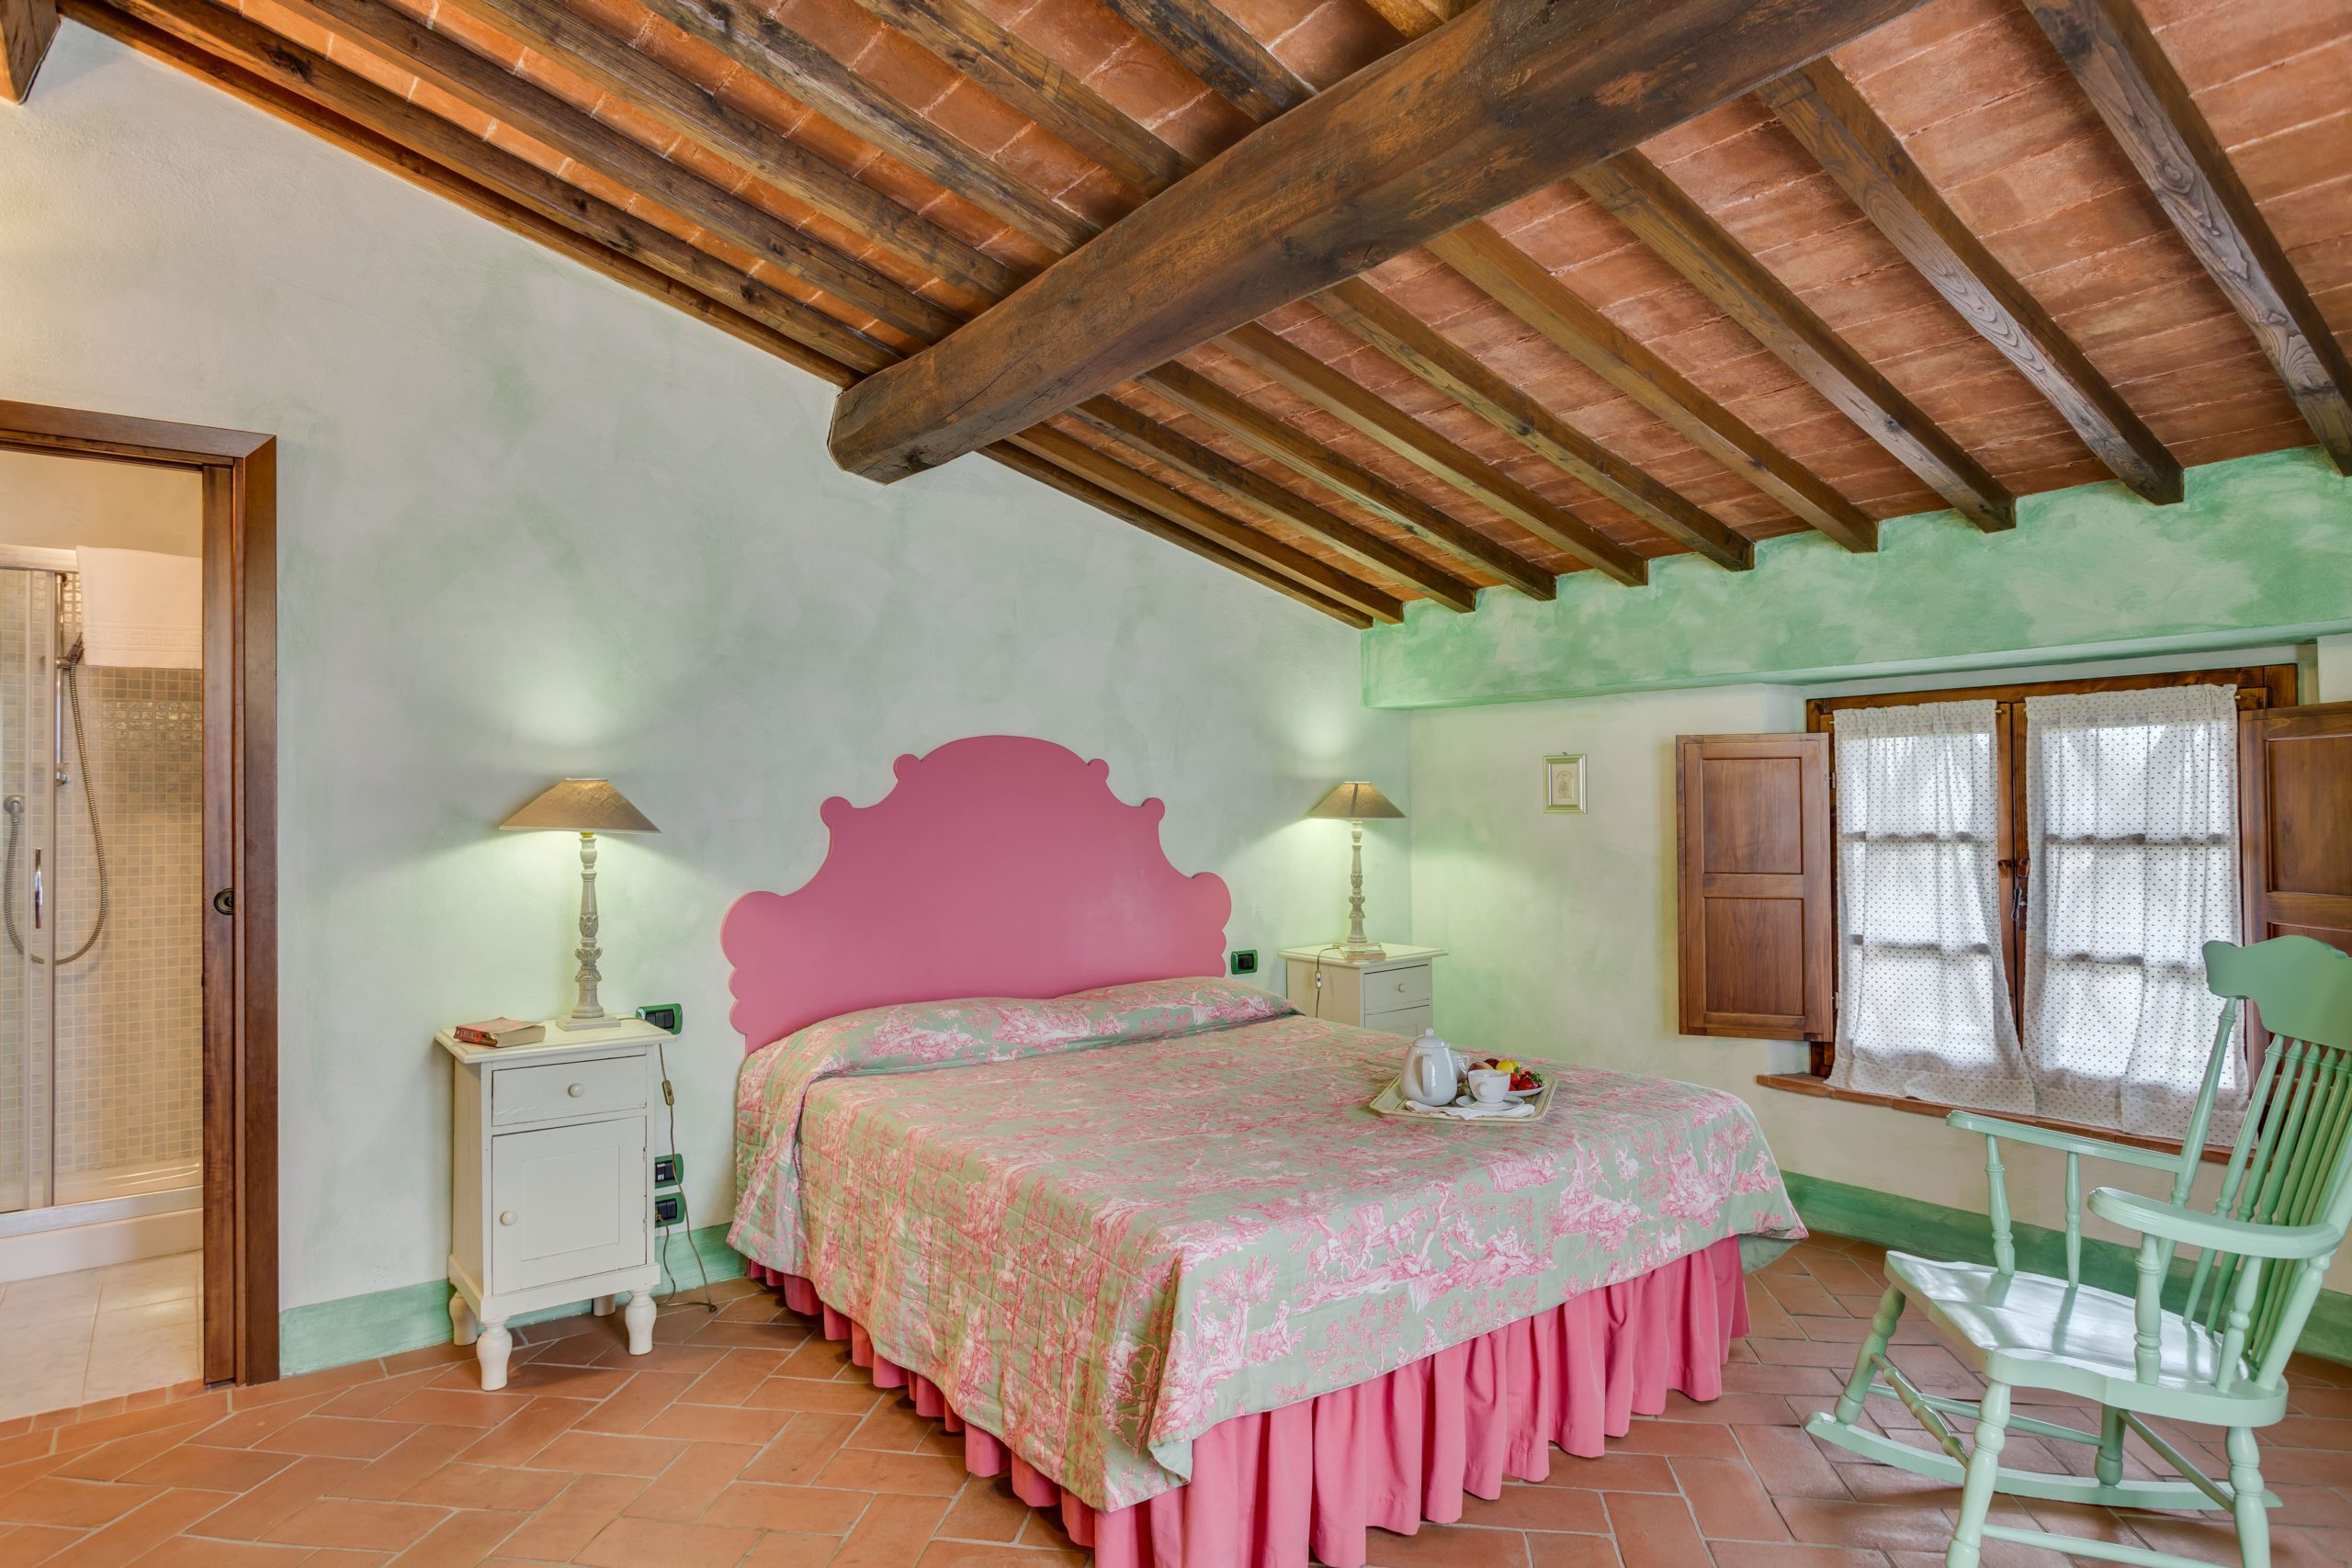 L'Aia slaapkamer